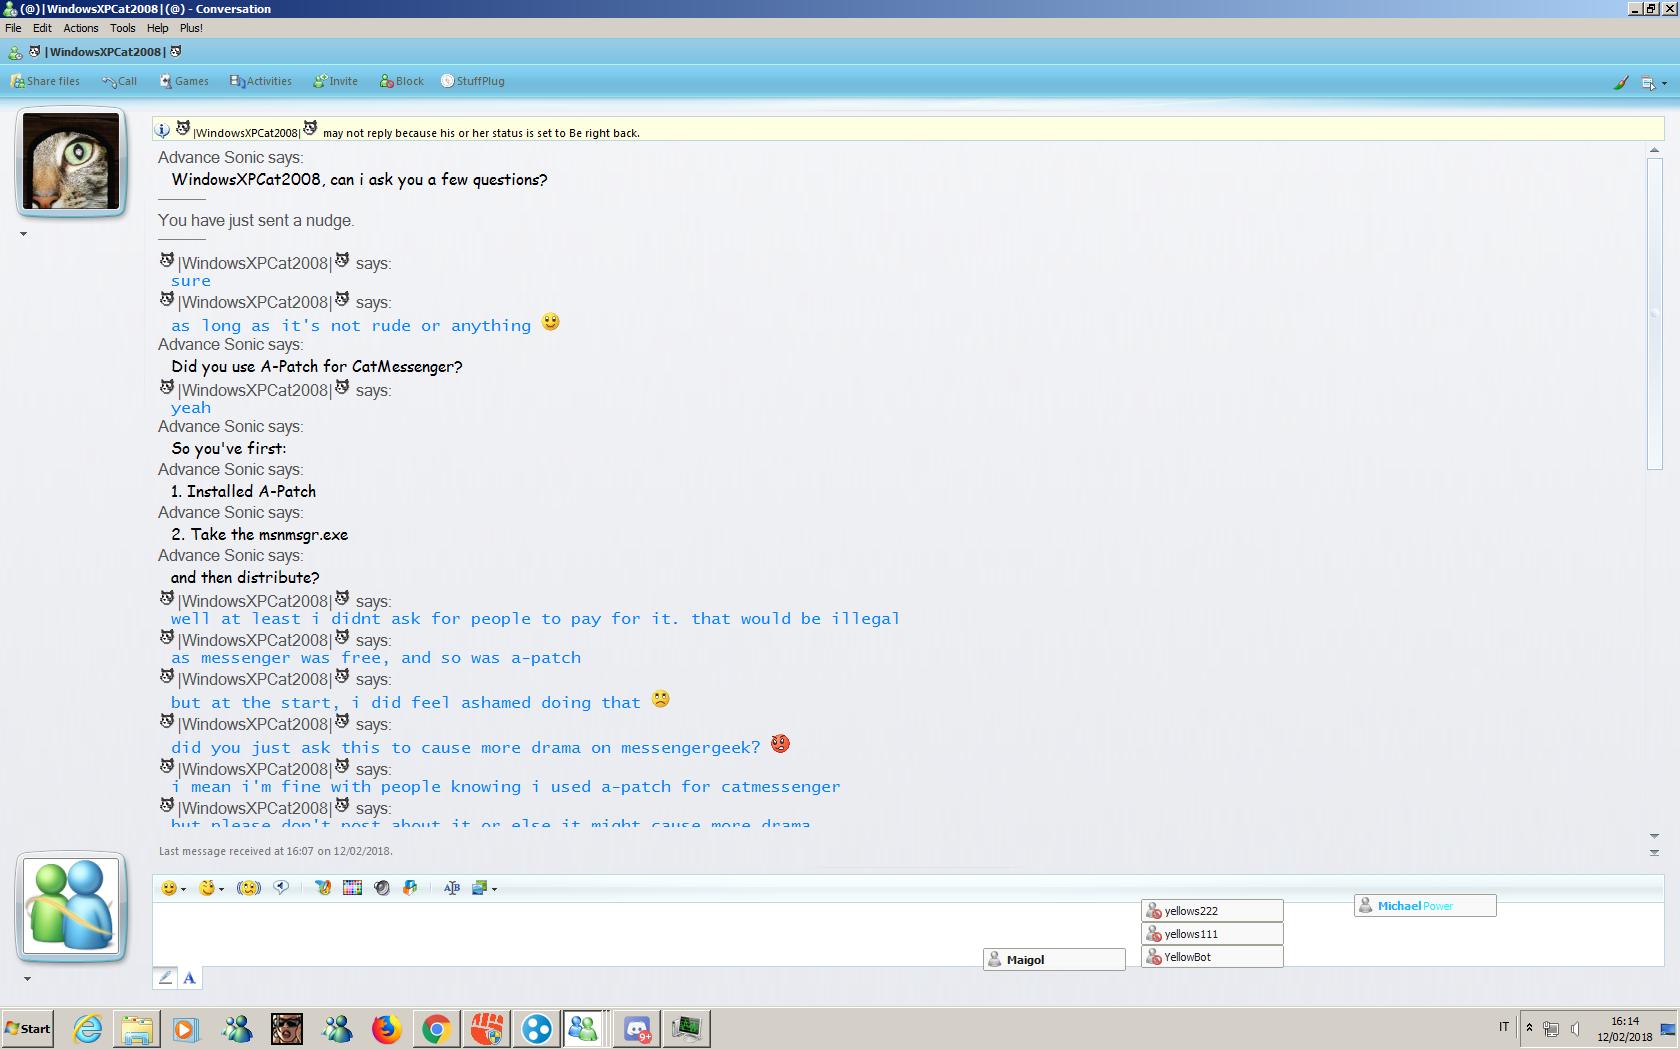 WindowsXPCat2008 admits that he used Ashley's MSN Server + A